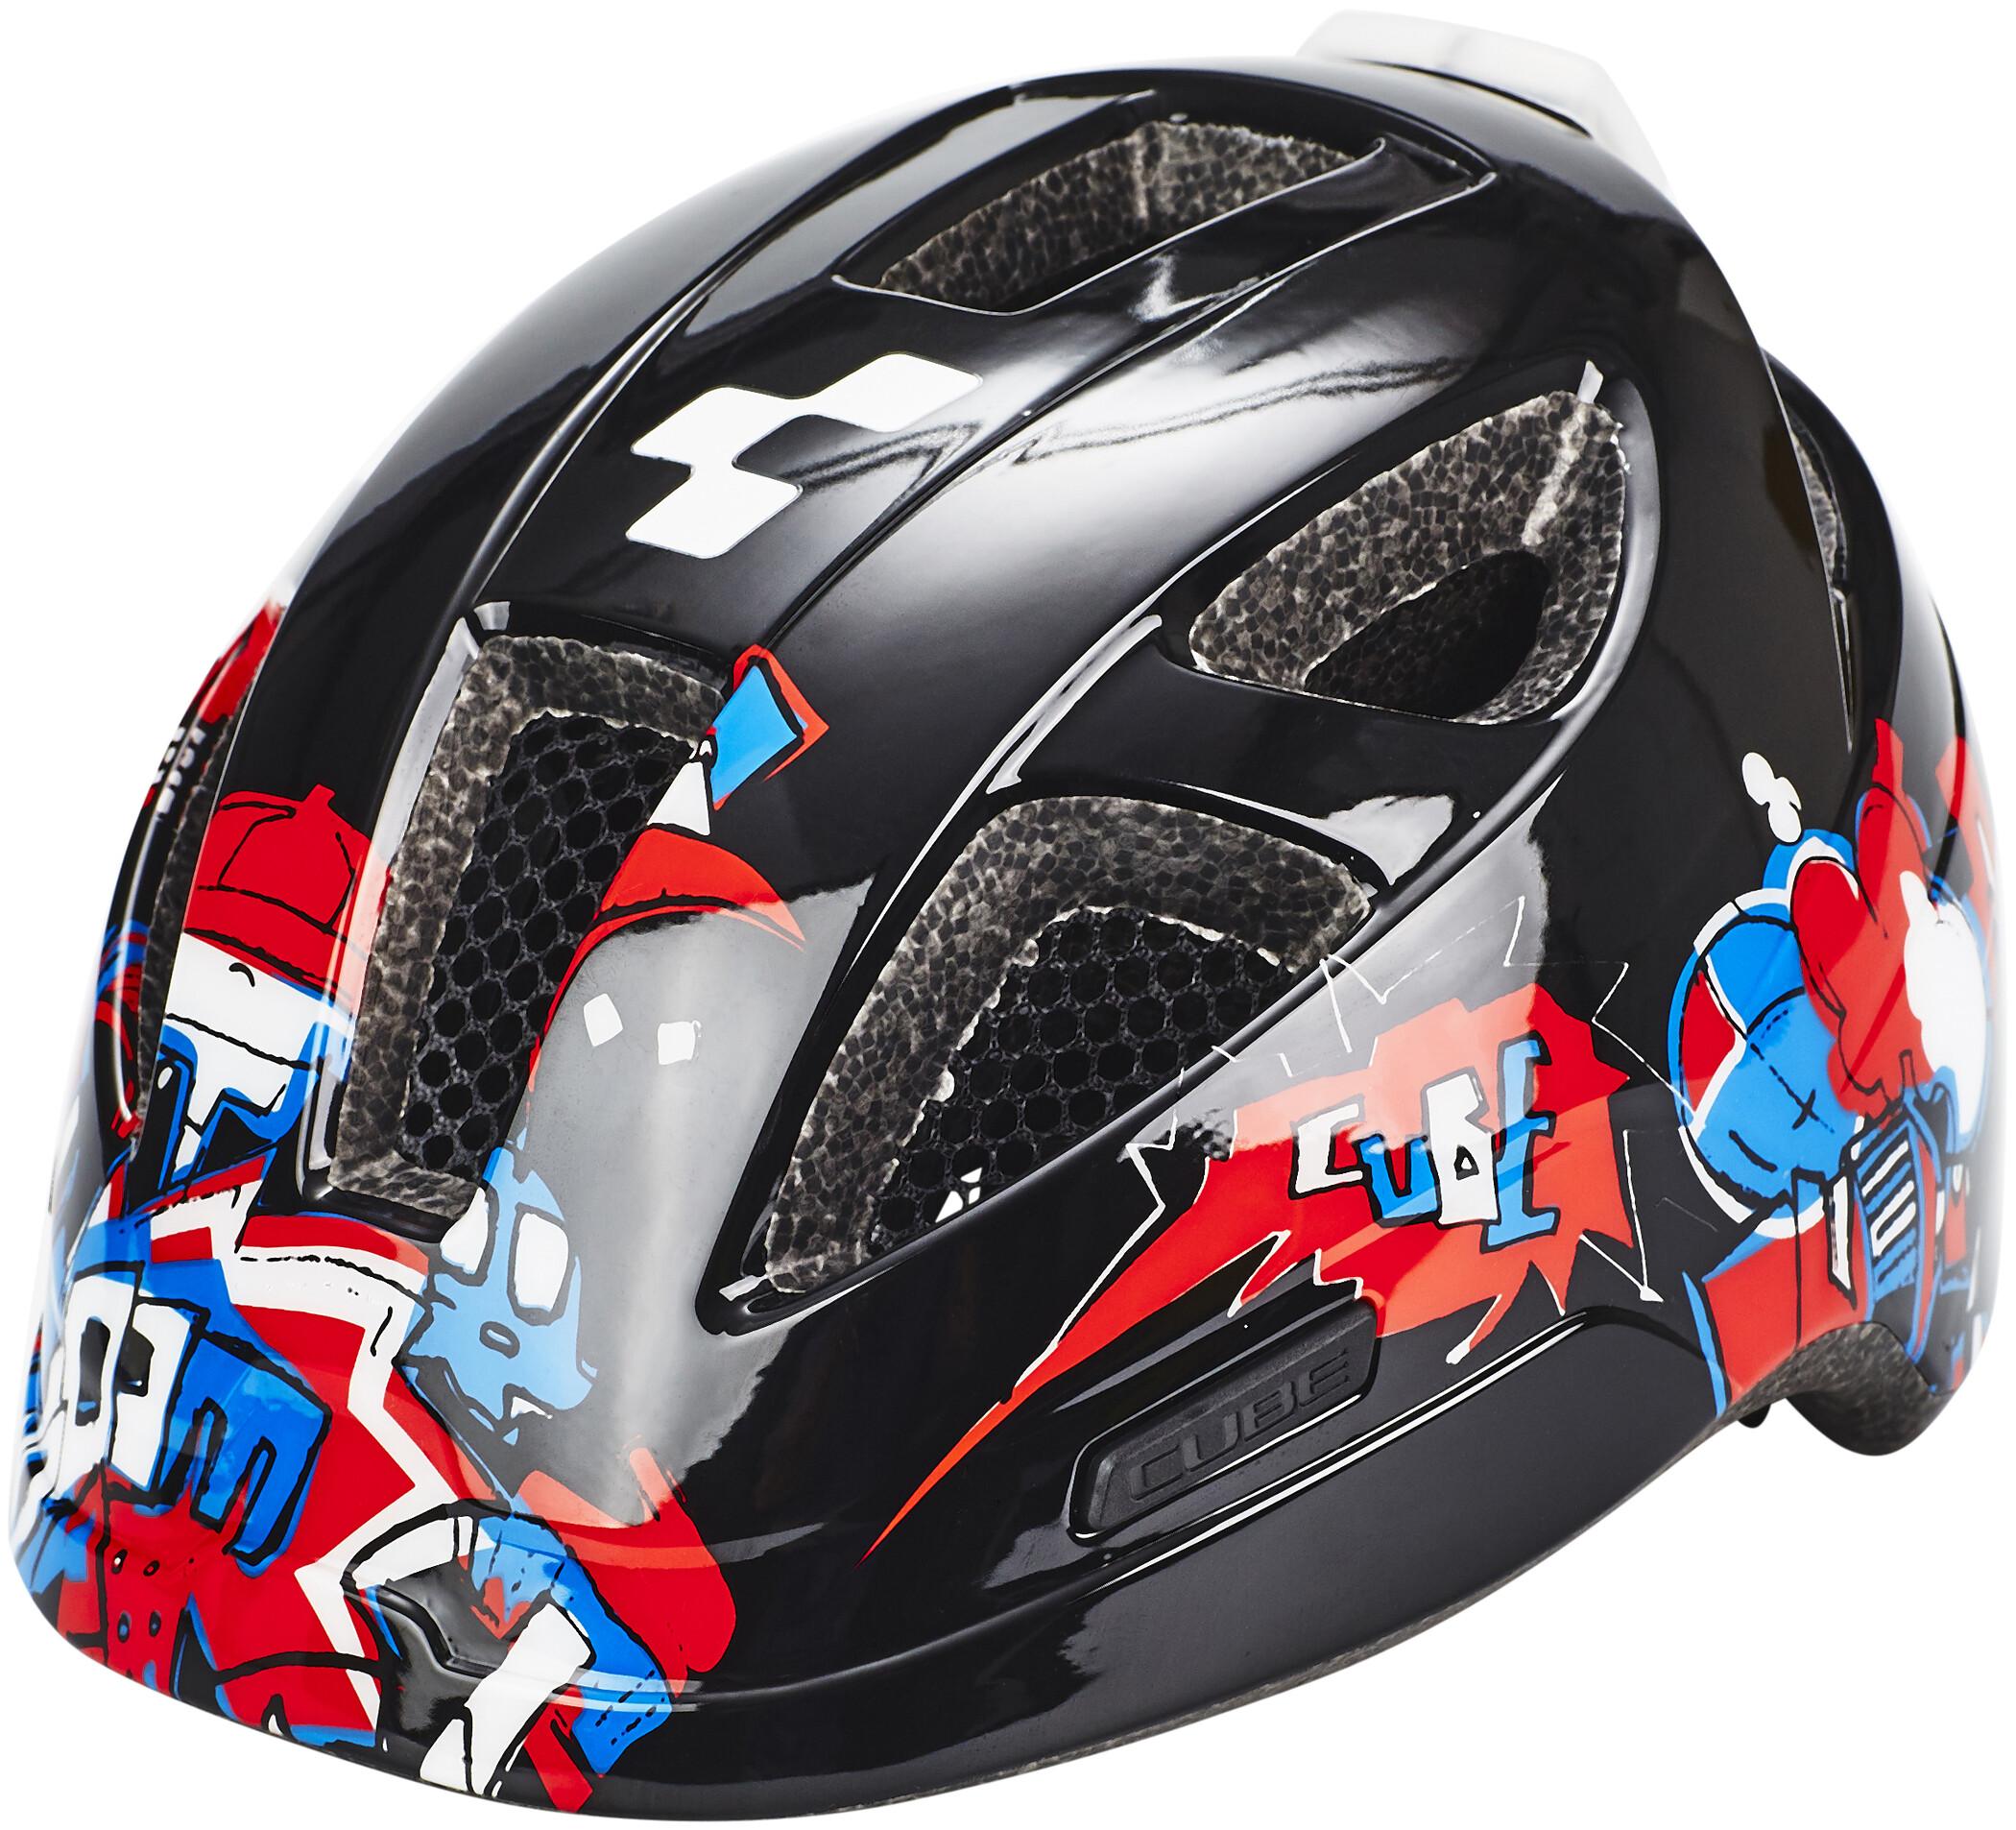 Cube Lume Cykelhjelm Børn, black grafitti (2019) | Helmets